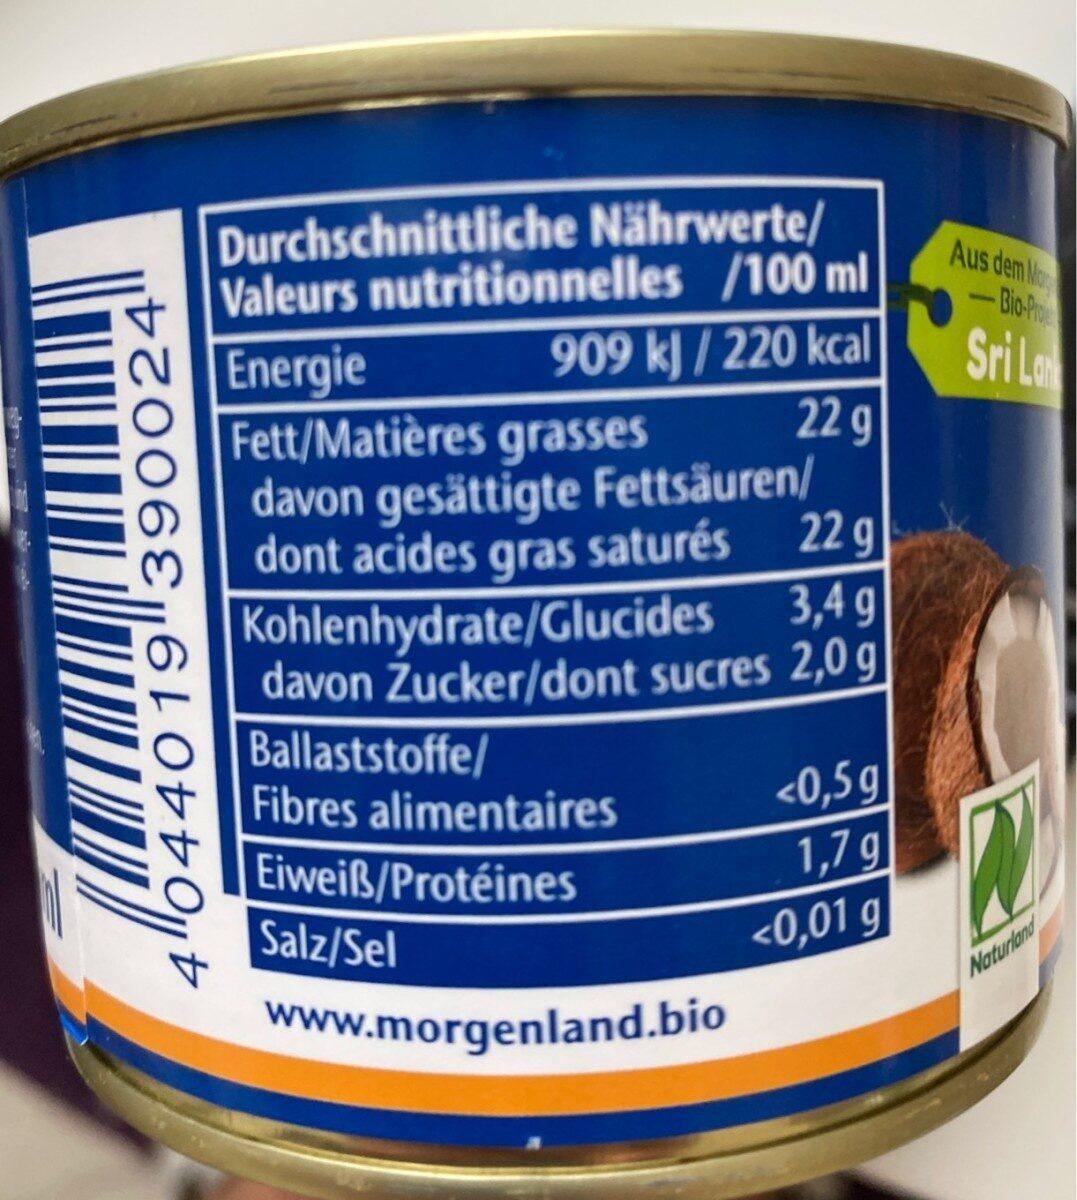 Lait De Coco 200 ML Morgenland - Voedingswaarden - fr